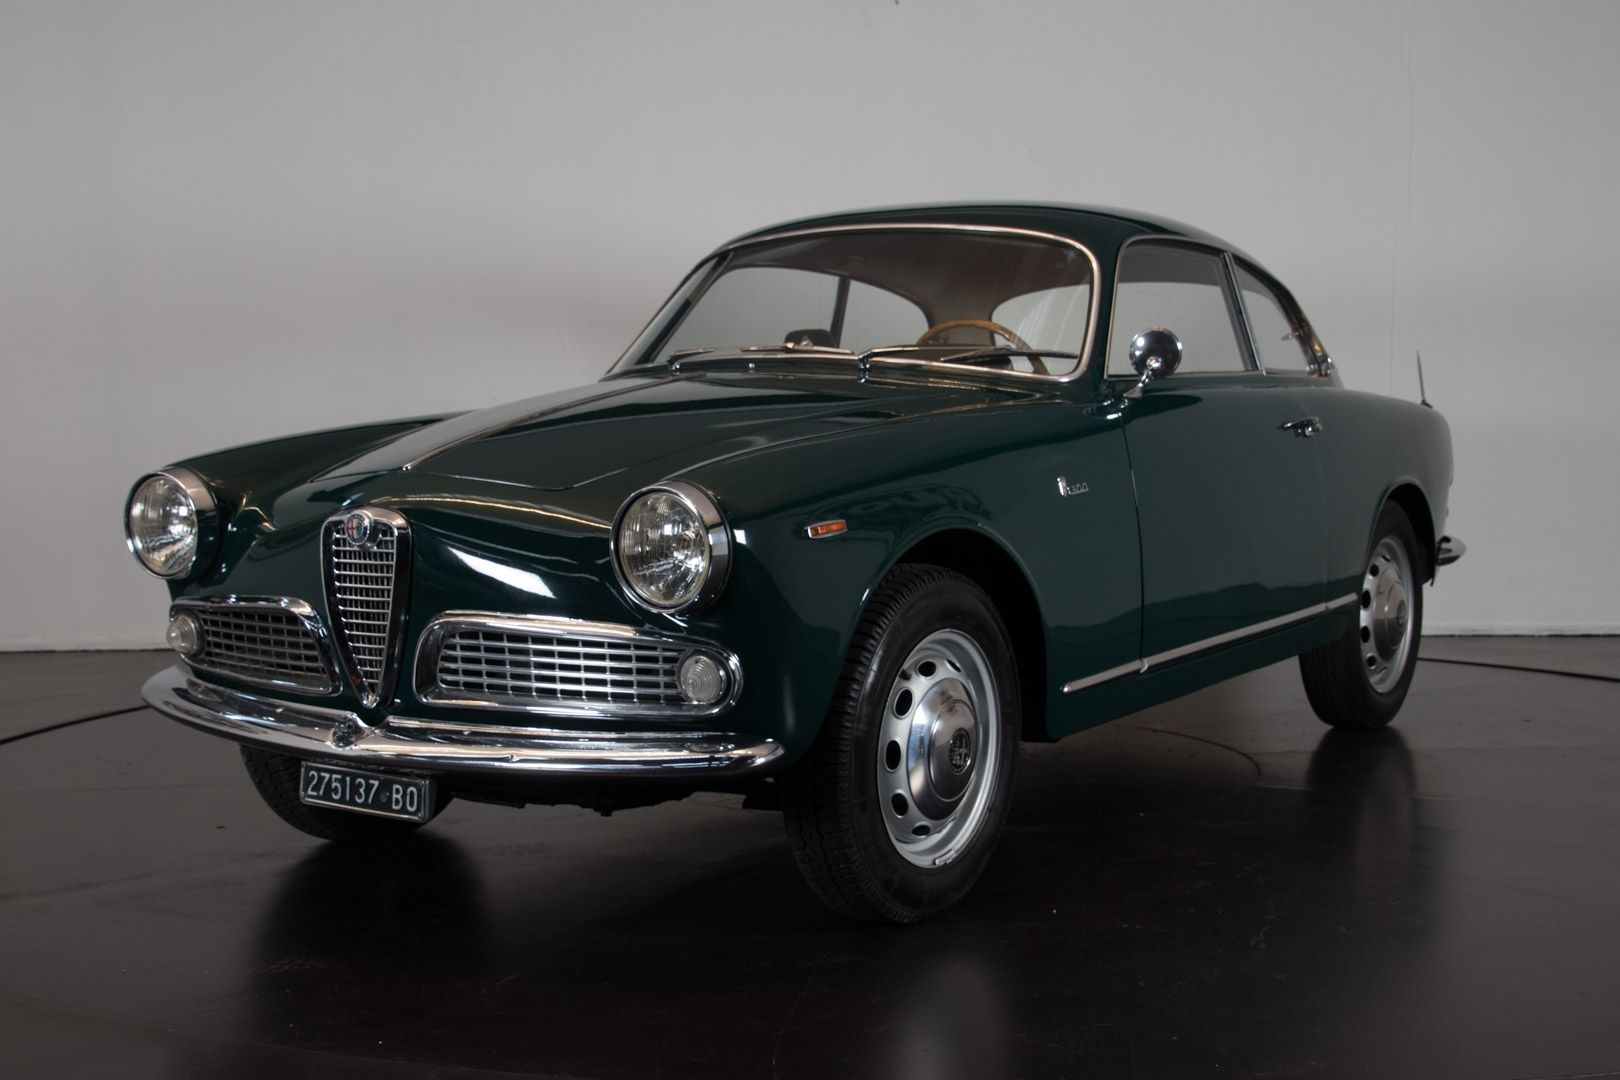 1964 Alfa Romeo Giulietta Sprint 1300 Classic cars